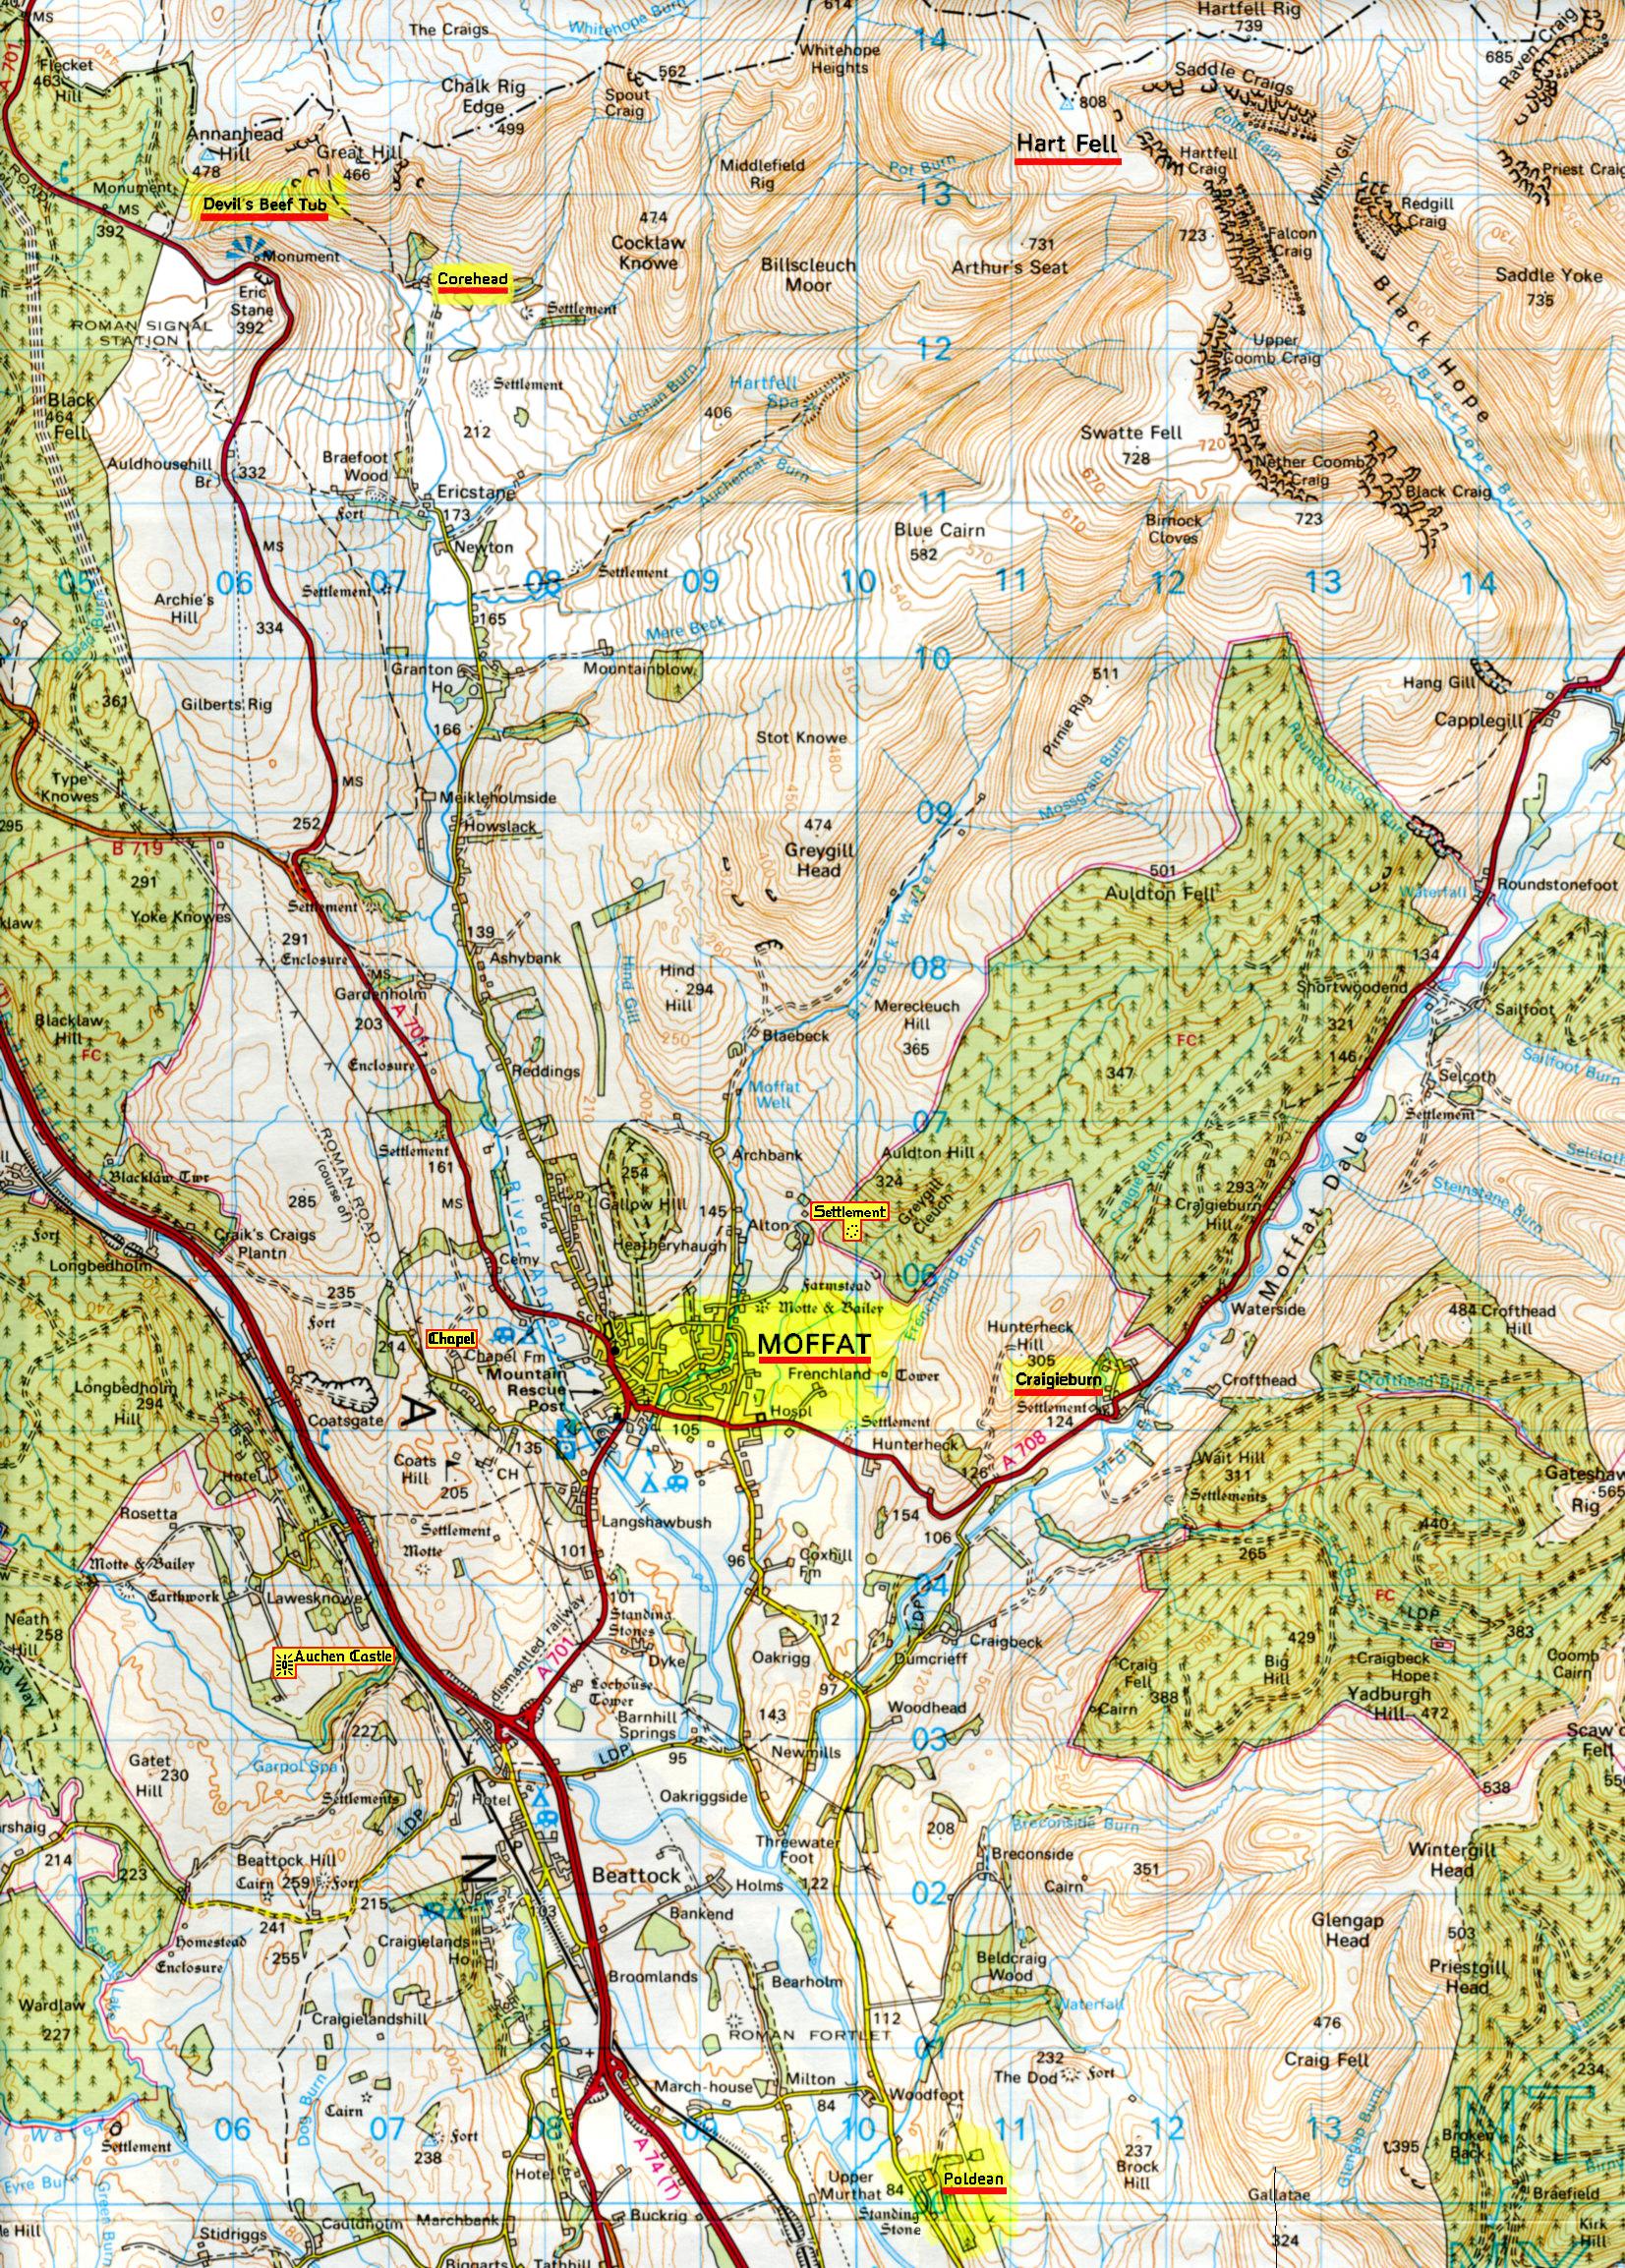 Map - Devils Beef Tub & Poldean